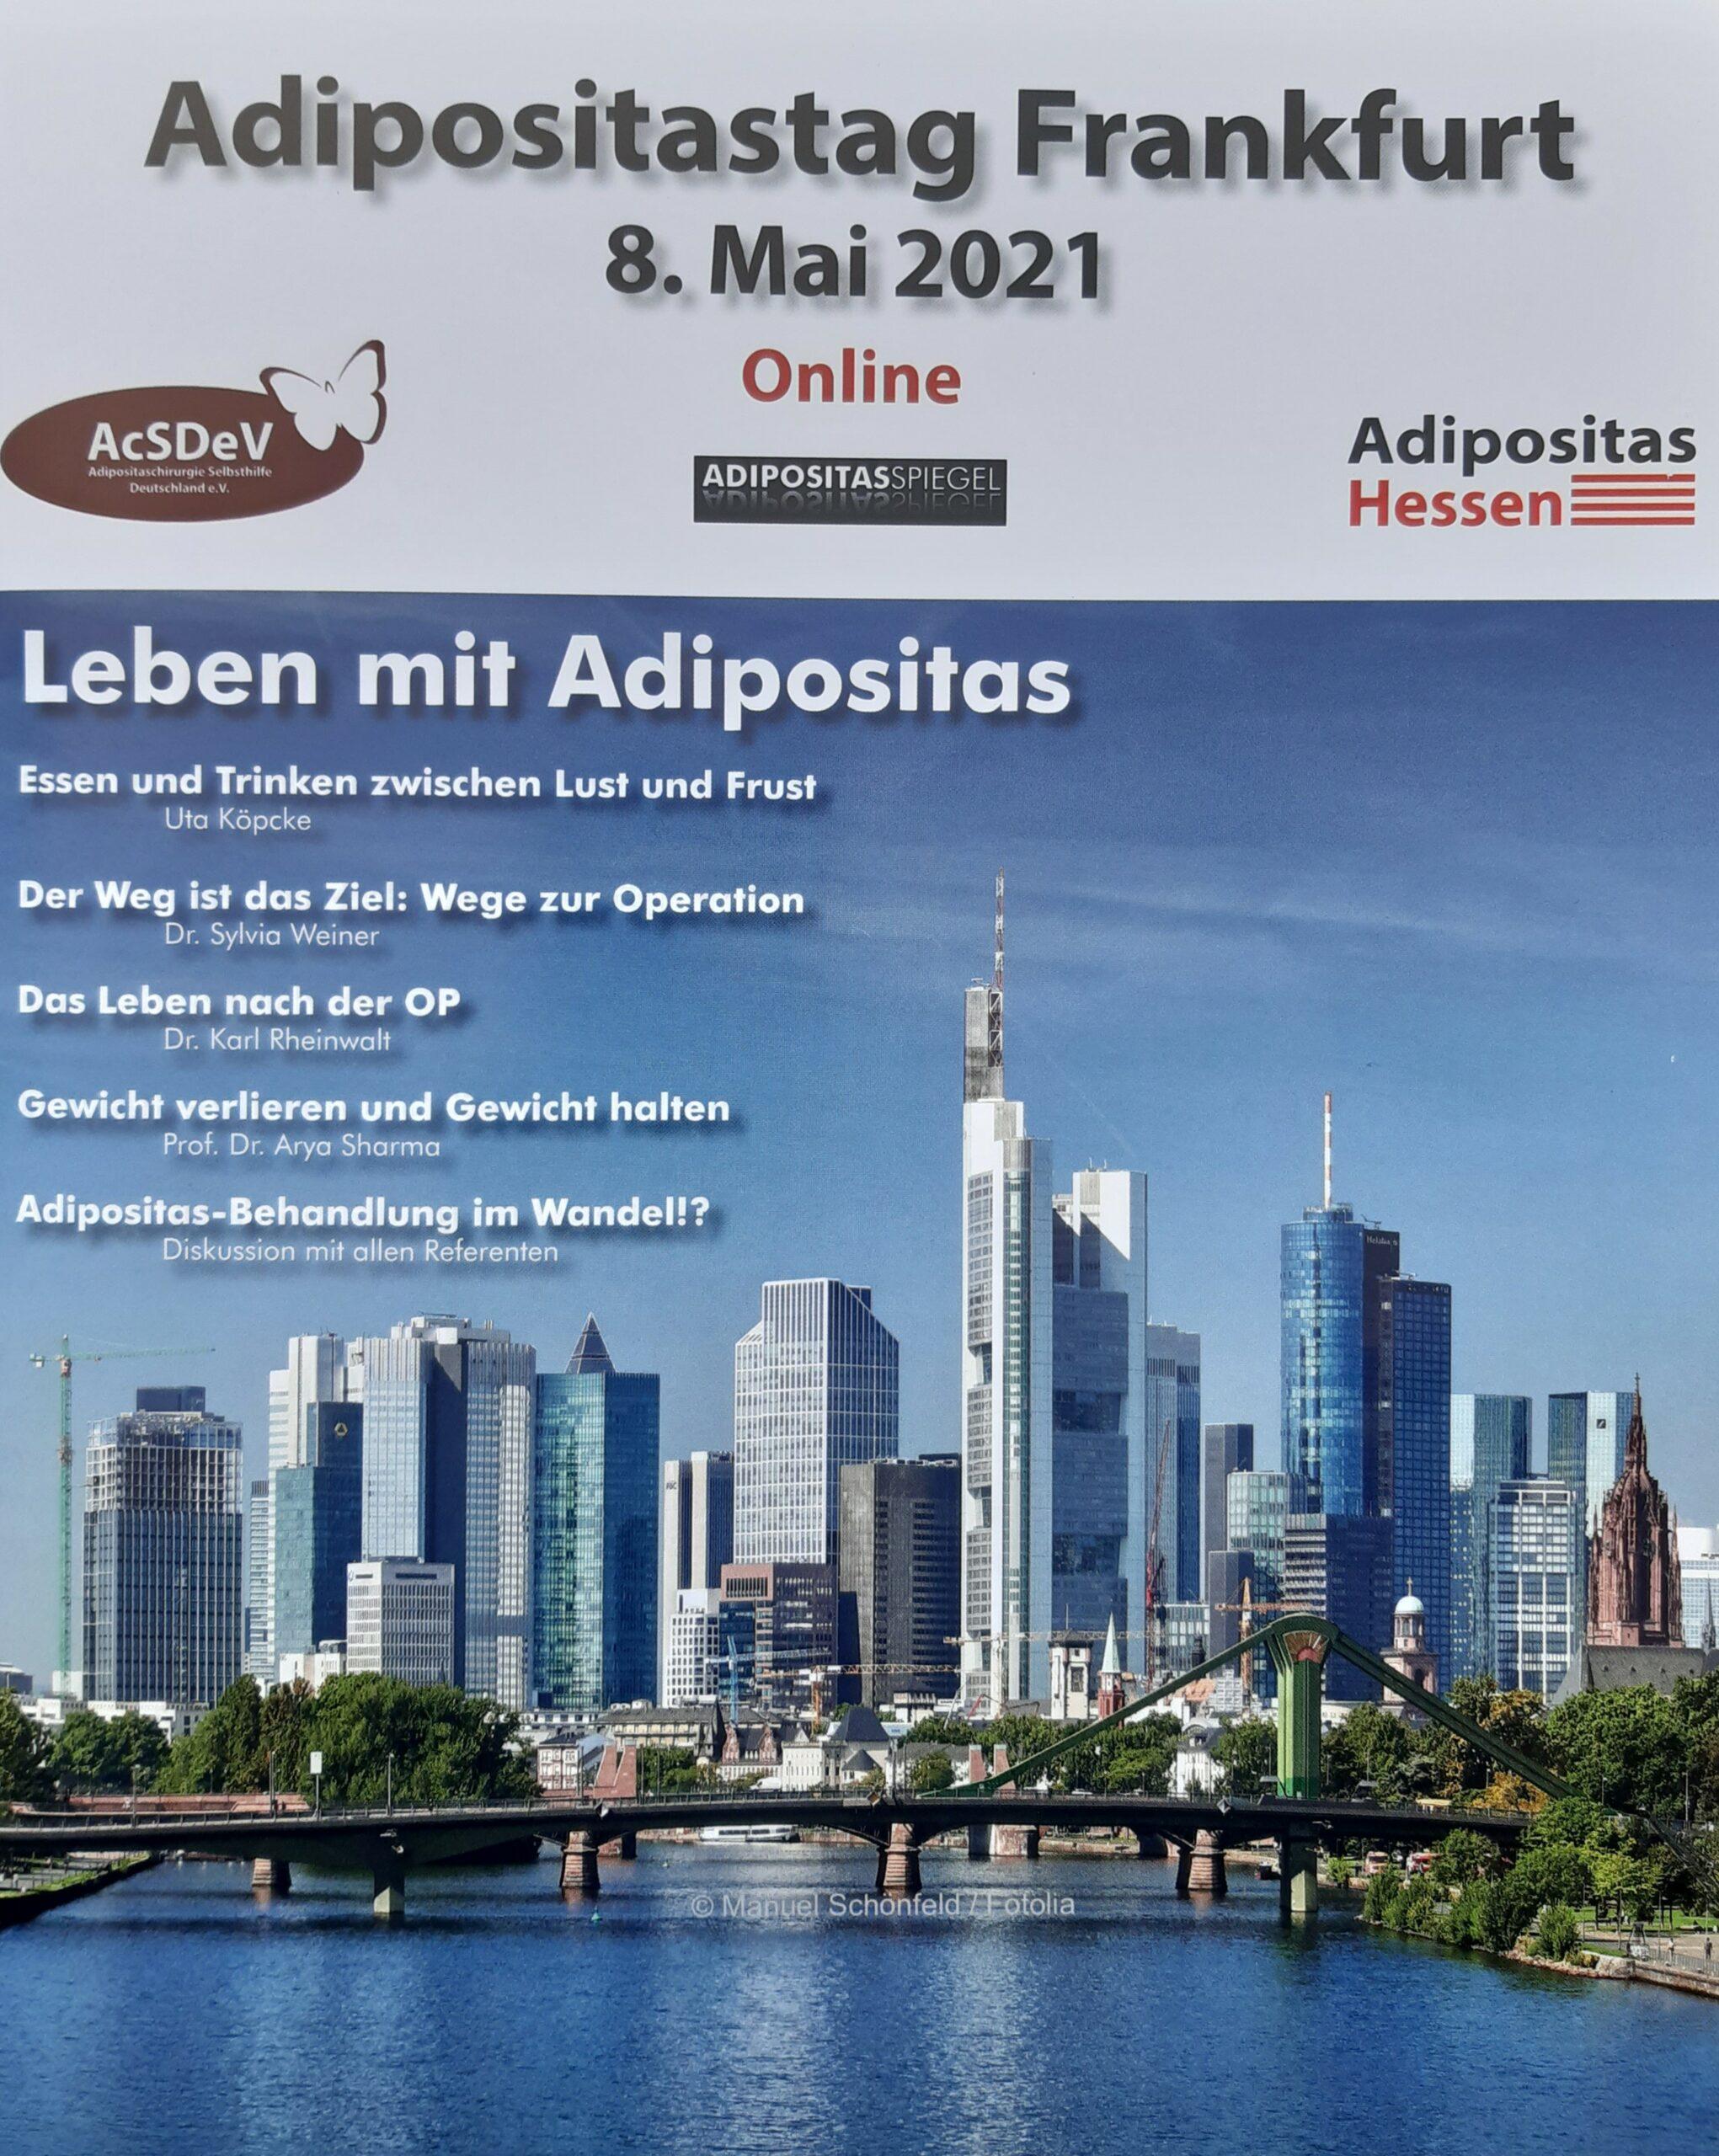 Foto Adipositastag 2021 online aus Frankfurt in Oldenburg verfolgt